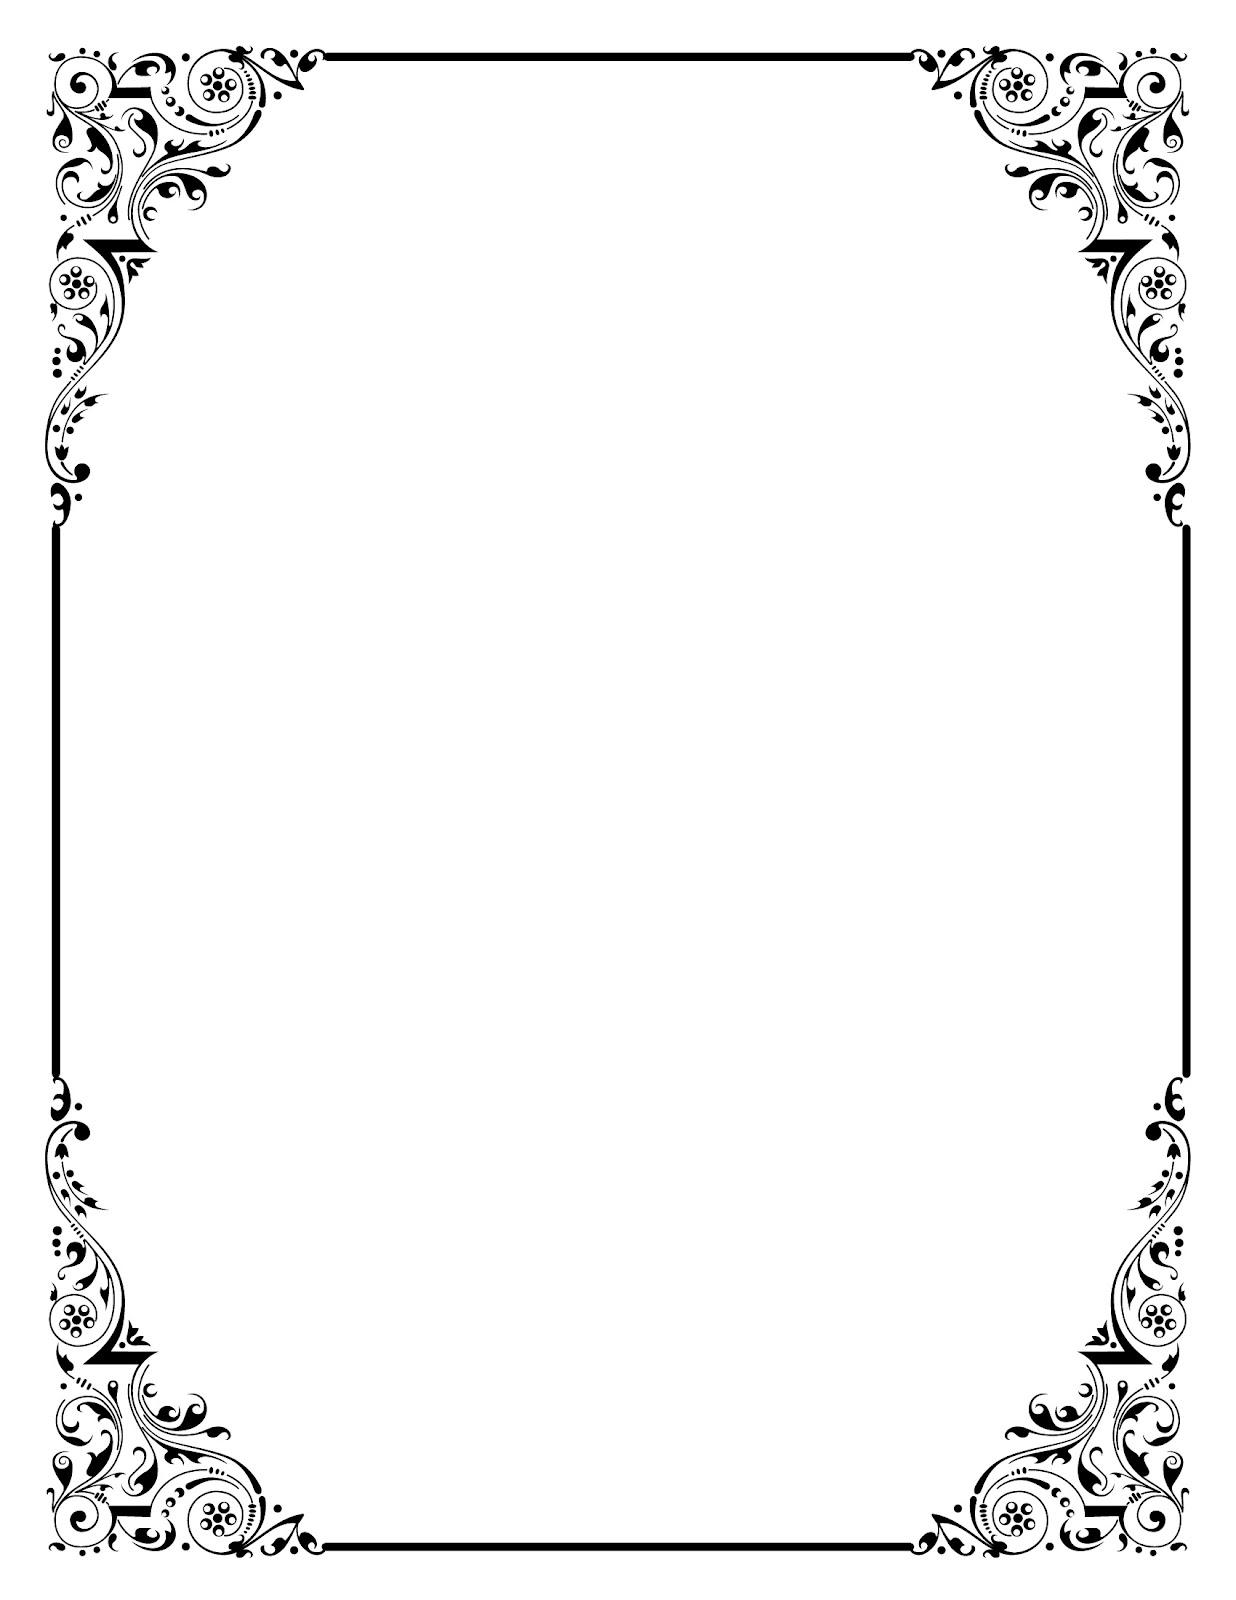 Clipart frames free caicdvrlistscom